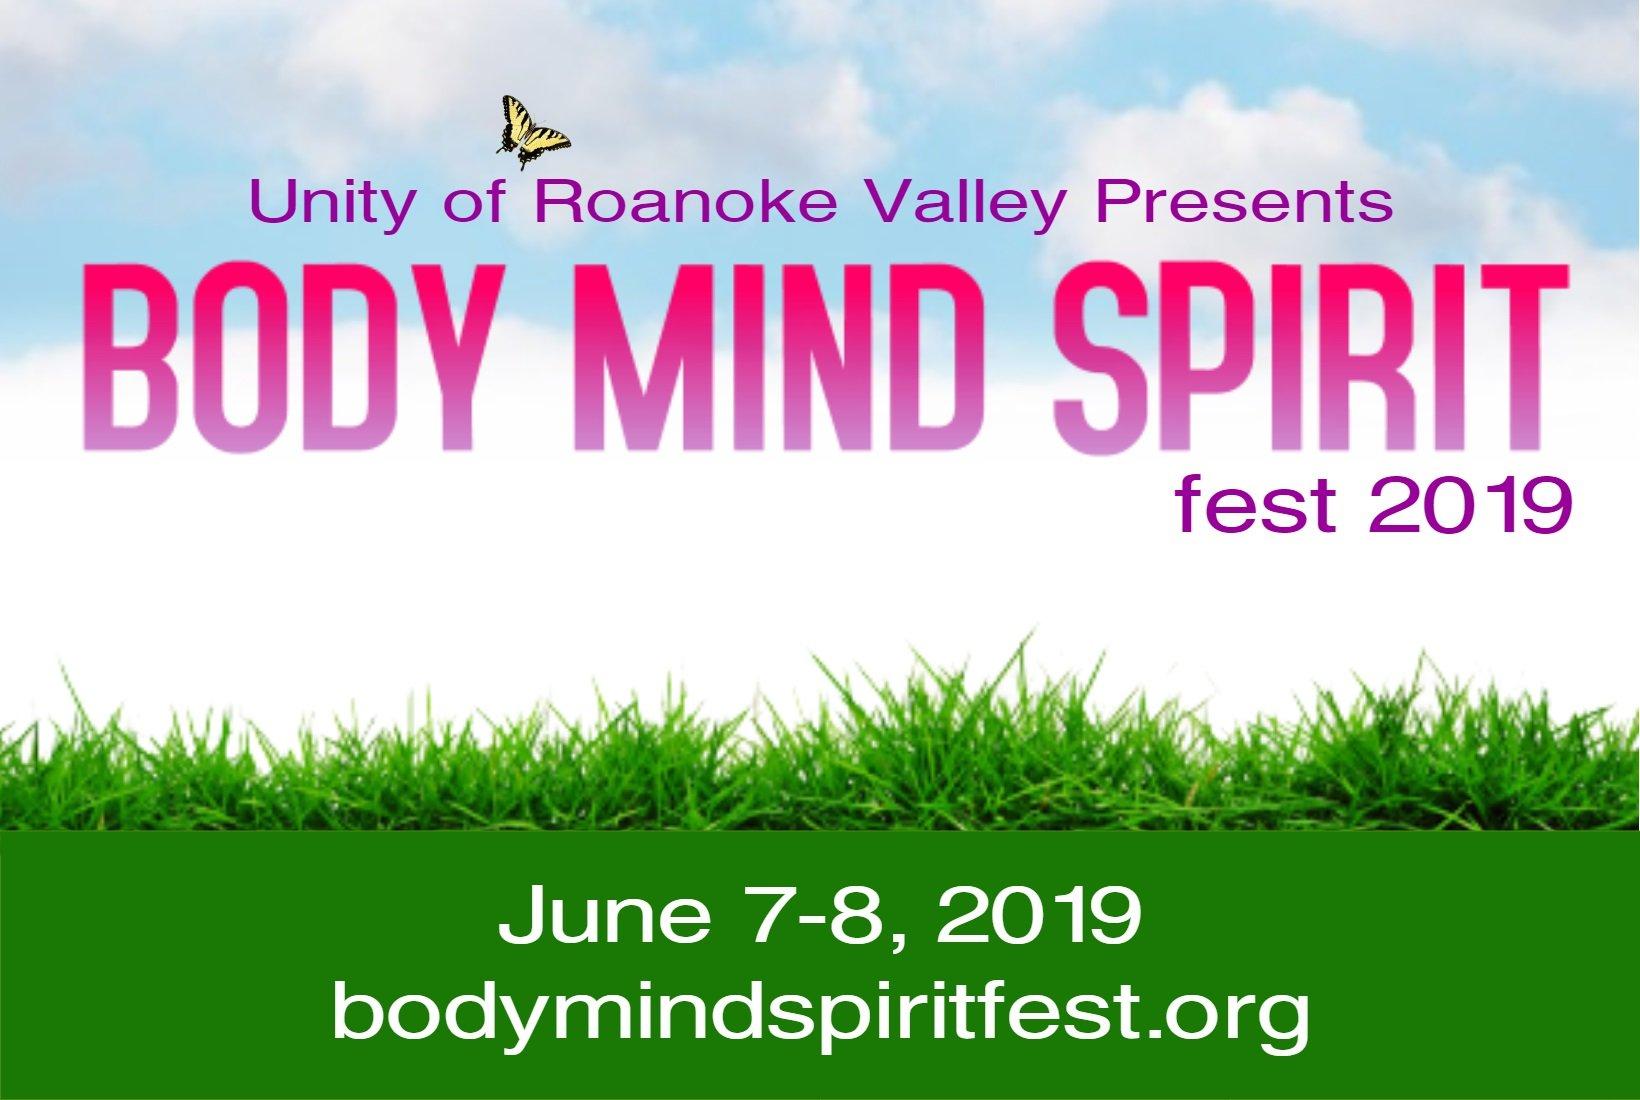 Body Mind Spirit Fest 2019 - TheRoanoker com